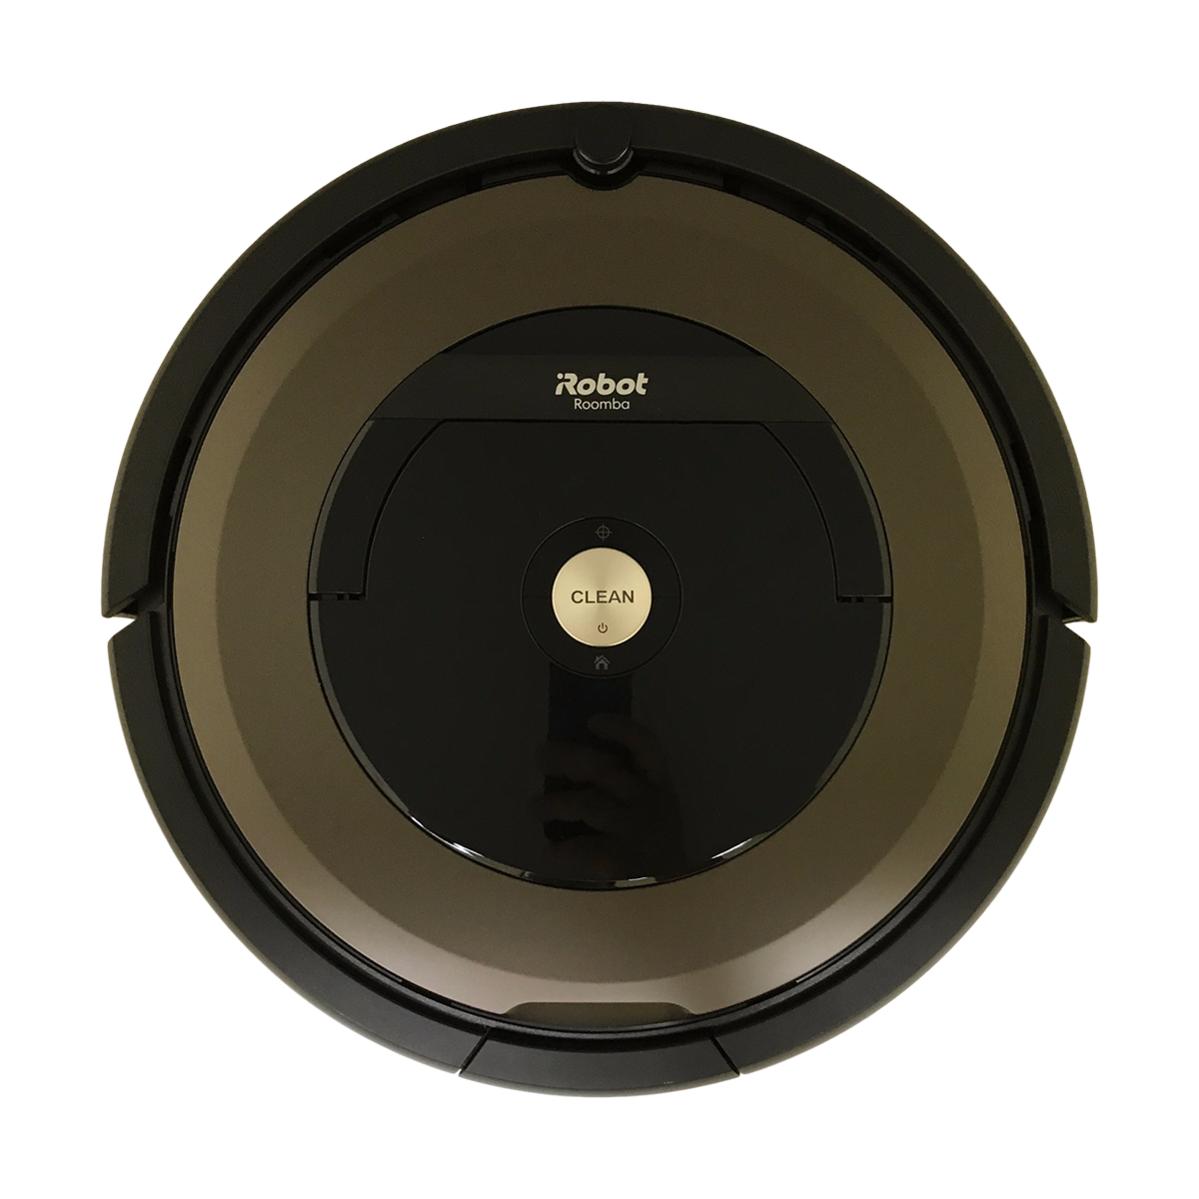 eBay: iRobot Roomba 890 Wi-Fi Connected Robot Vacuum - $449.99 Plus Free Shipping